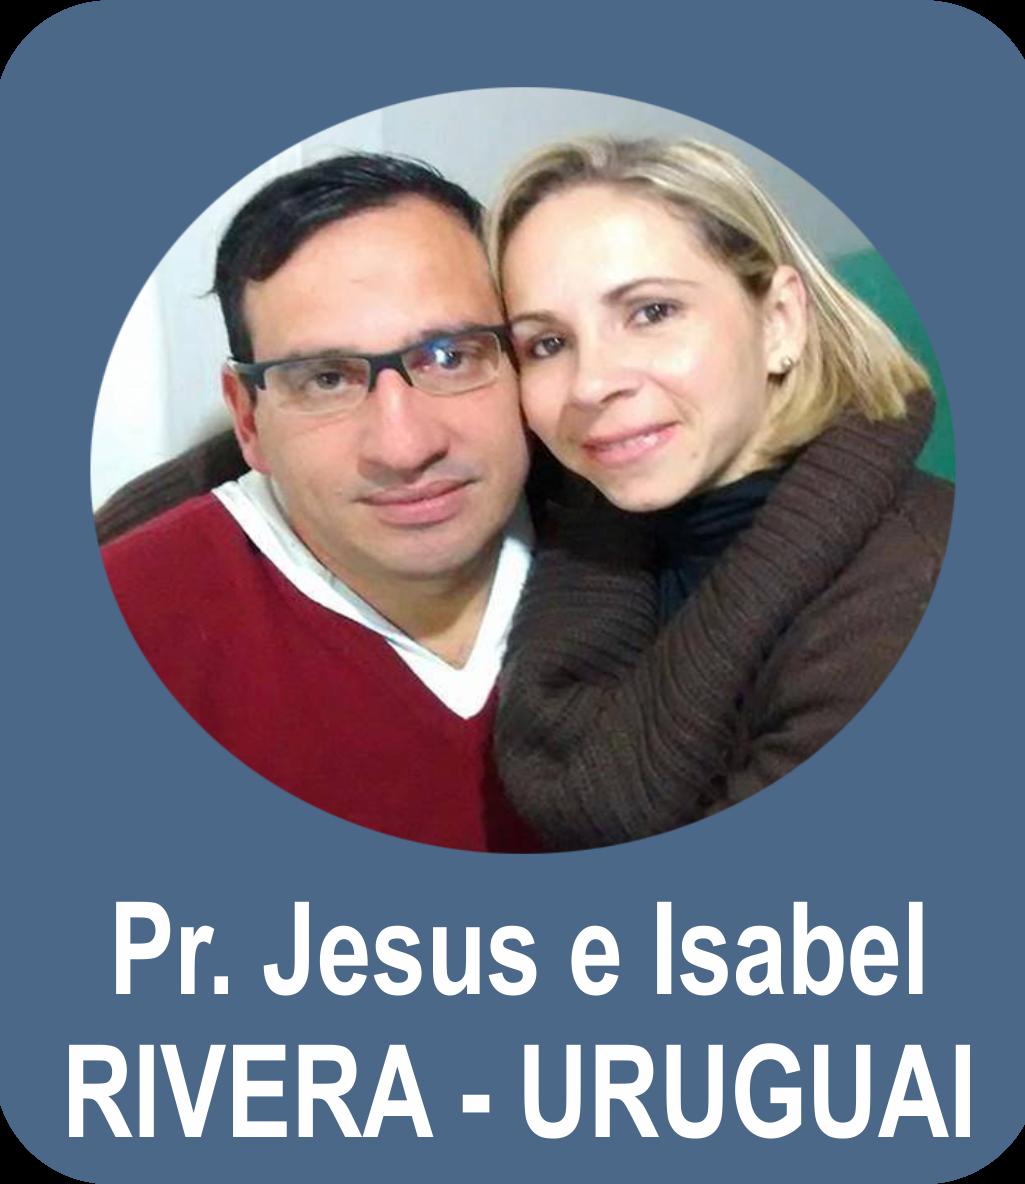 Missº. Jesus de Freitas e Miss. Isabel de Freitas - URUGUAI - Rivera